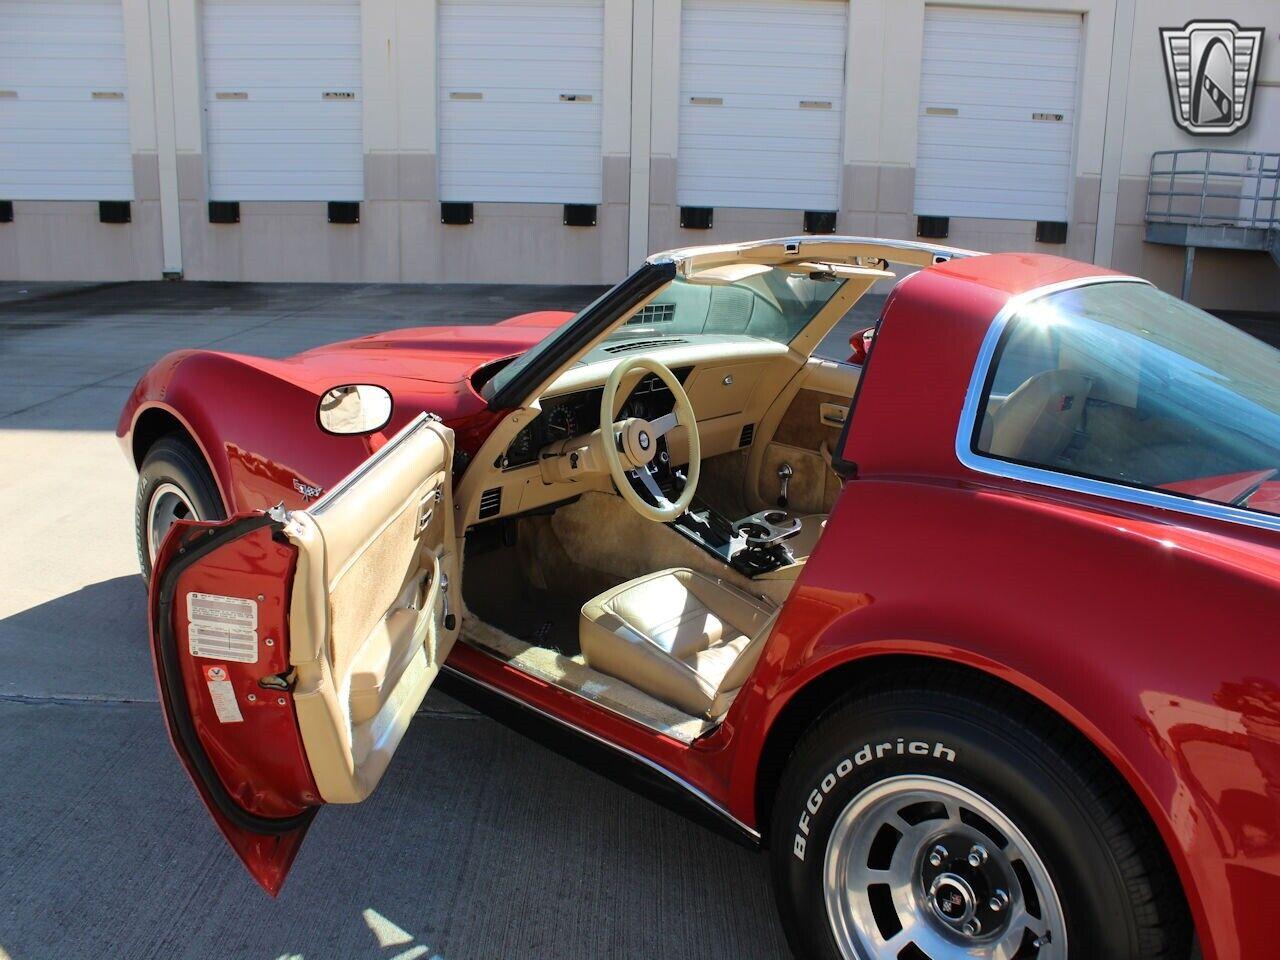 1978 Red Chevrolet Corvette   | C3 Corvette Photo 7